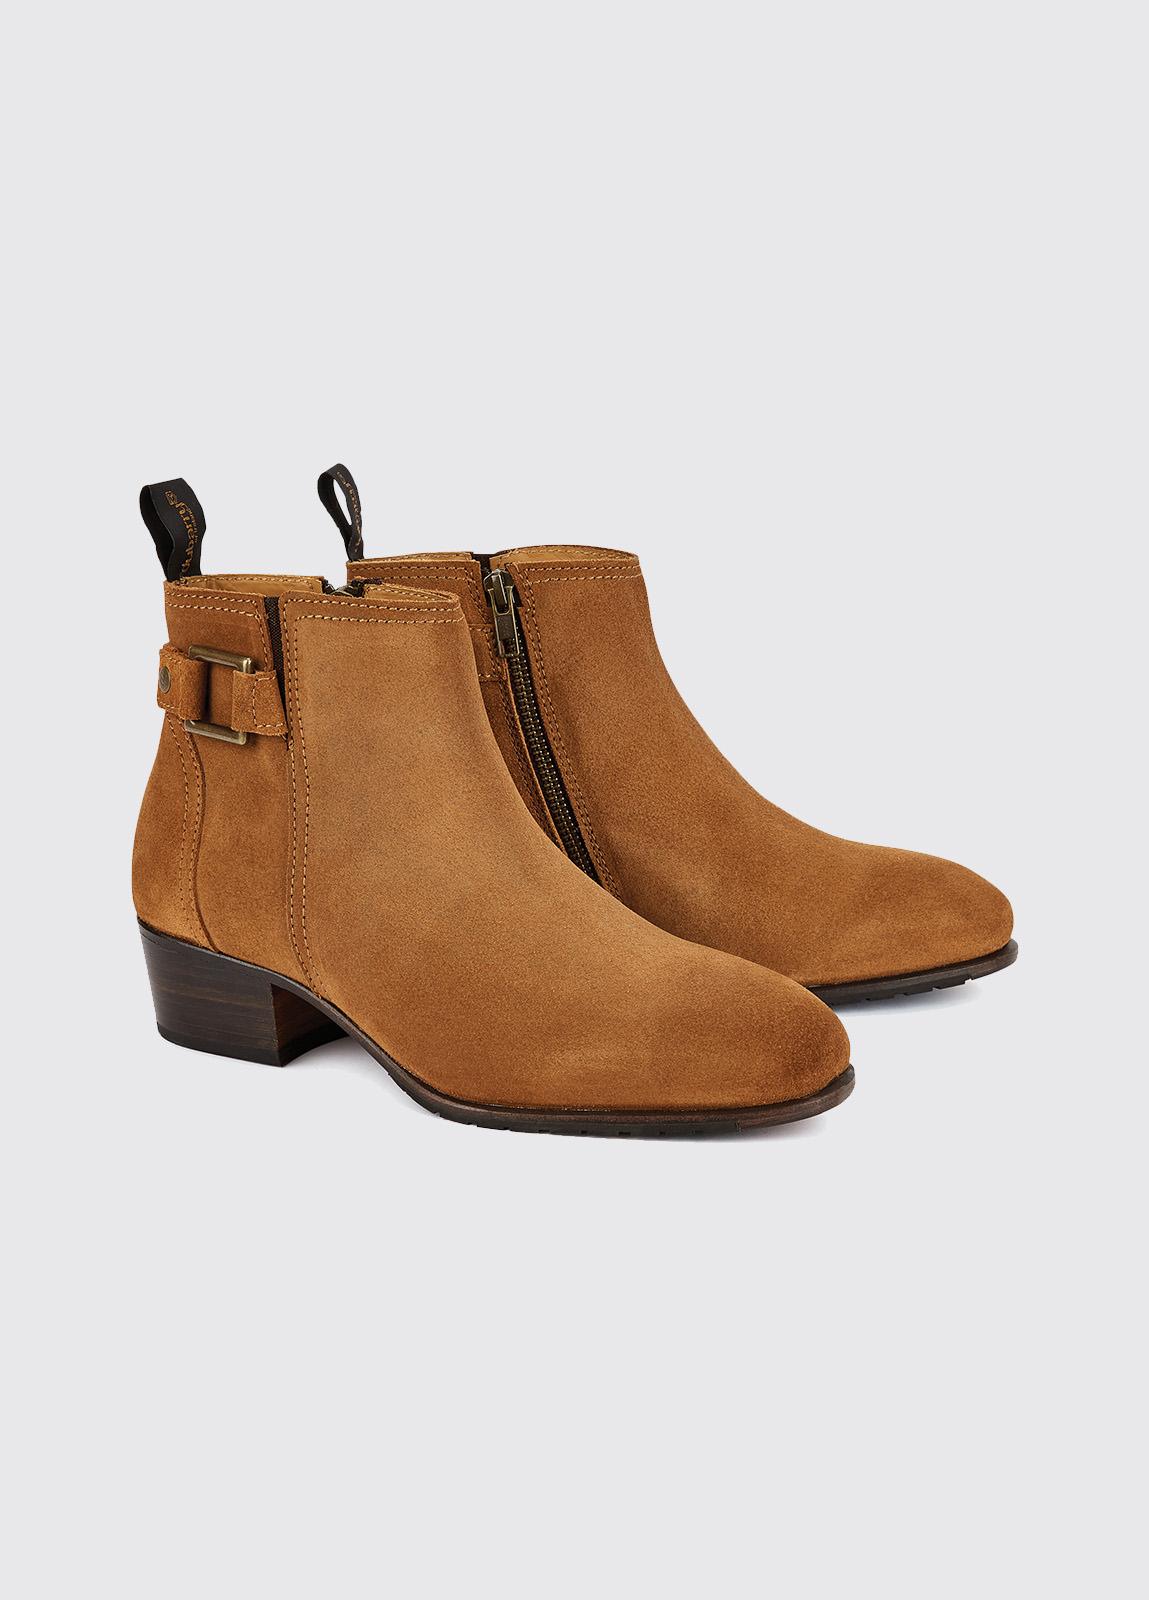 Dundalk Chelsea Boot - Camel